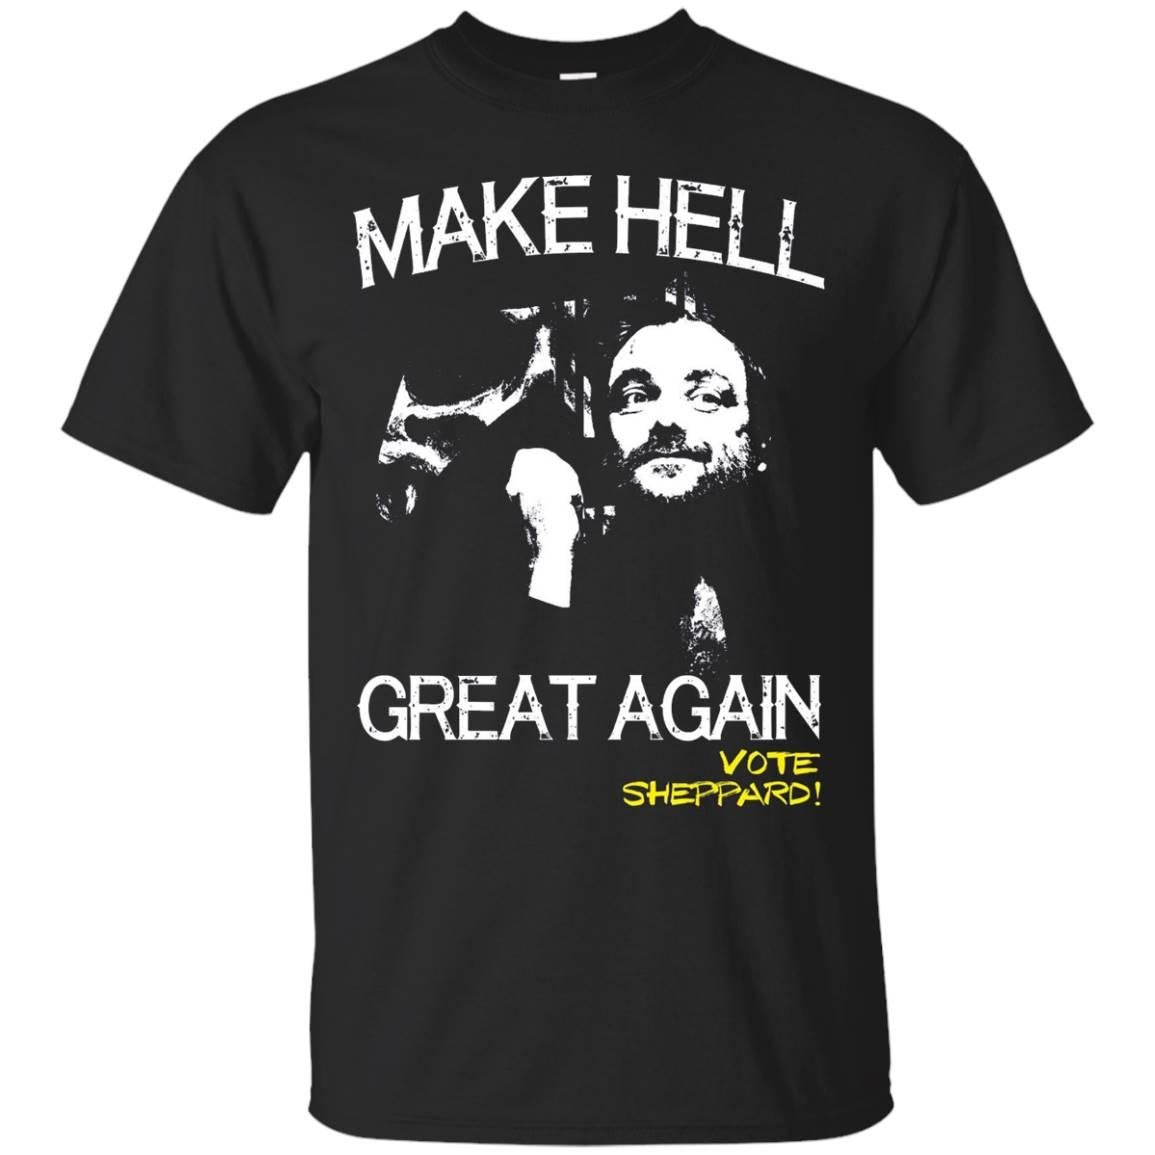 Make hell great again shirt